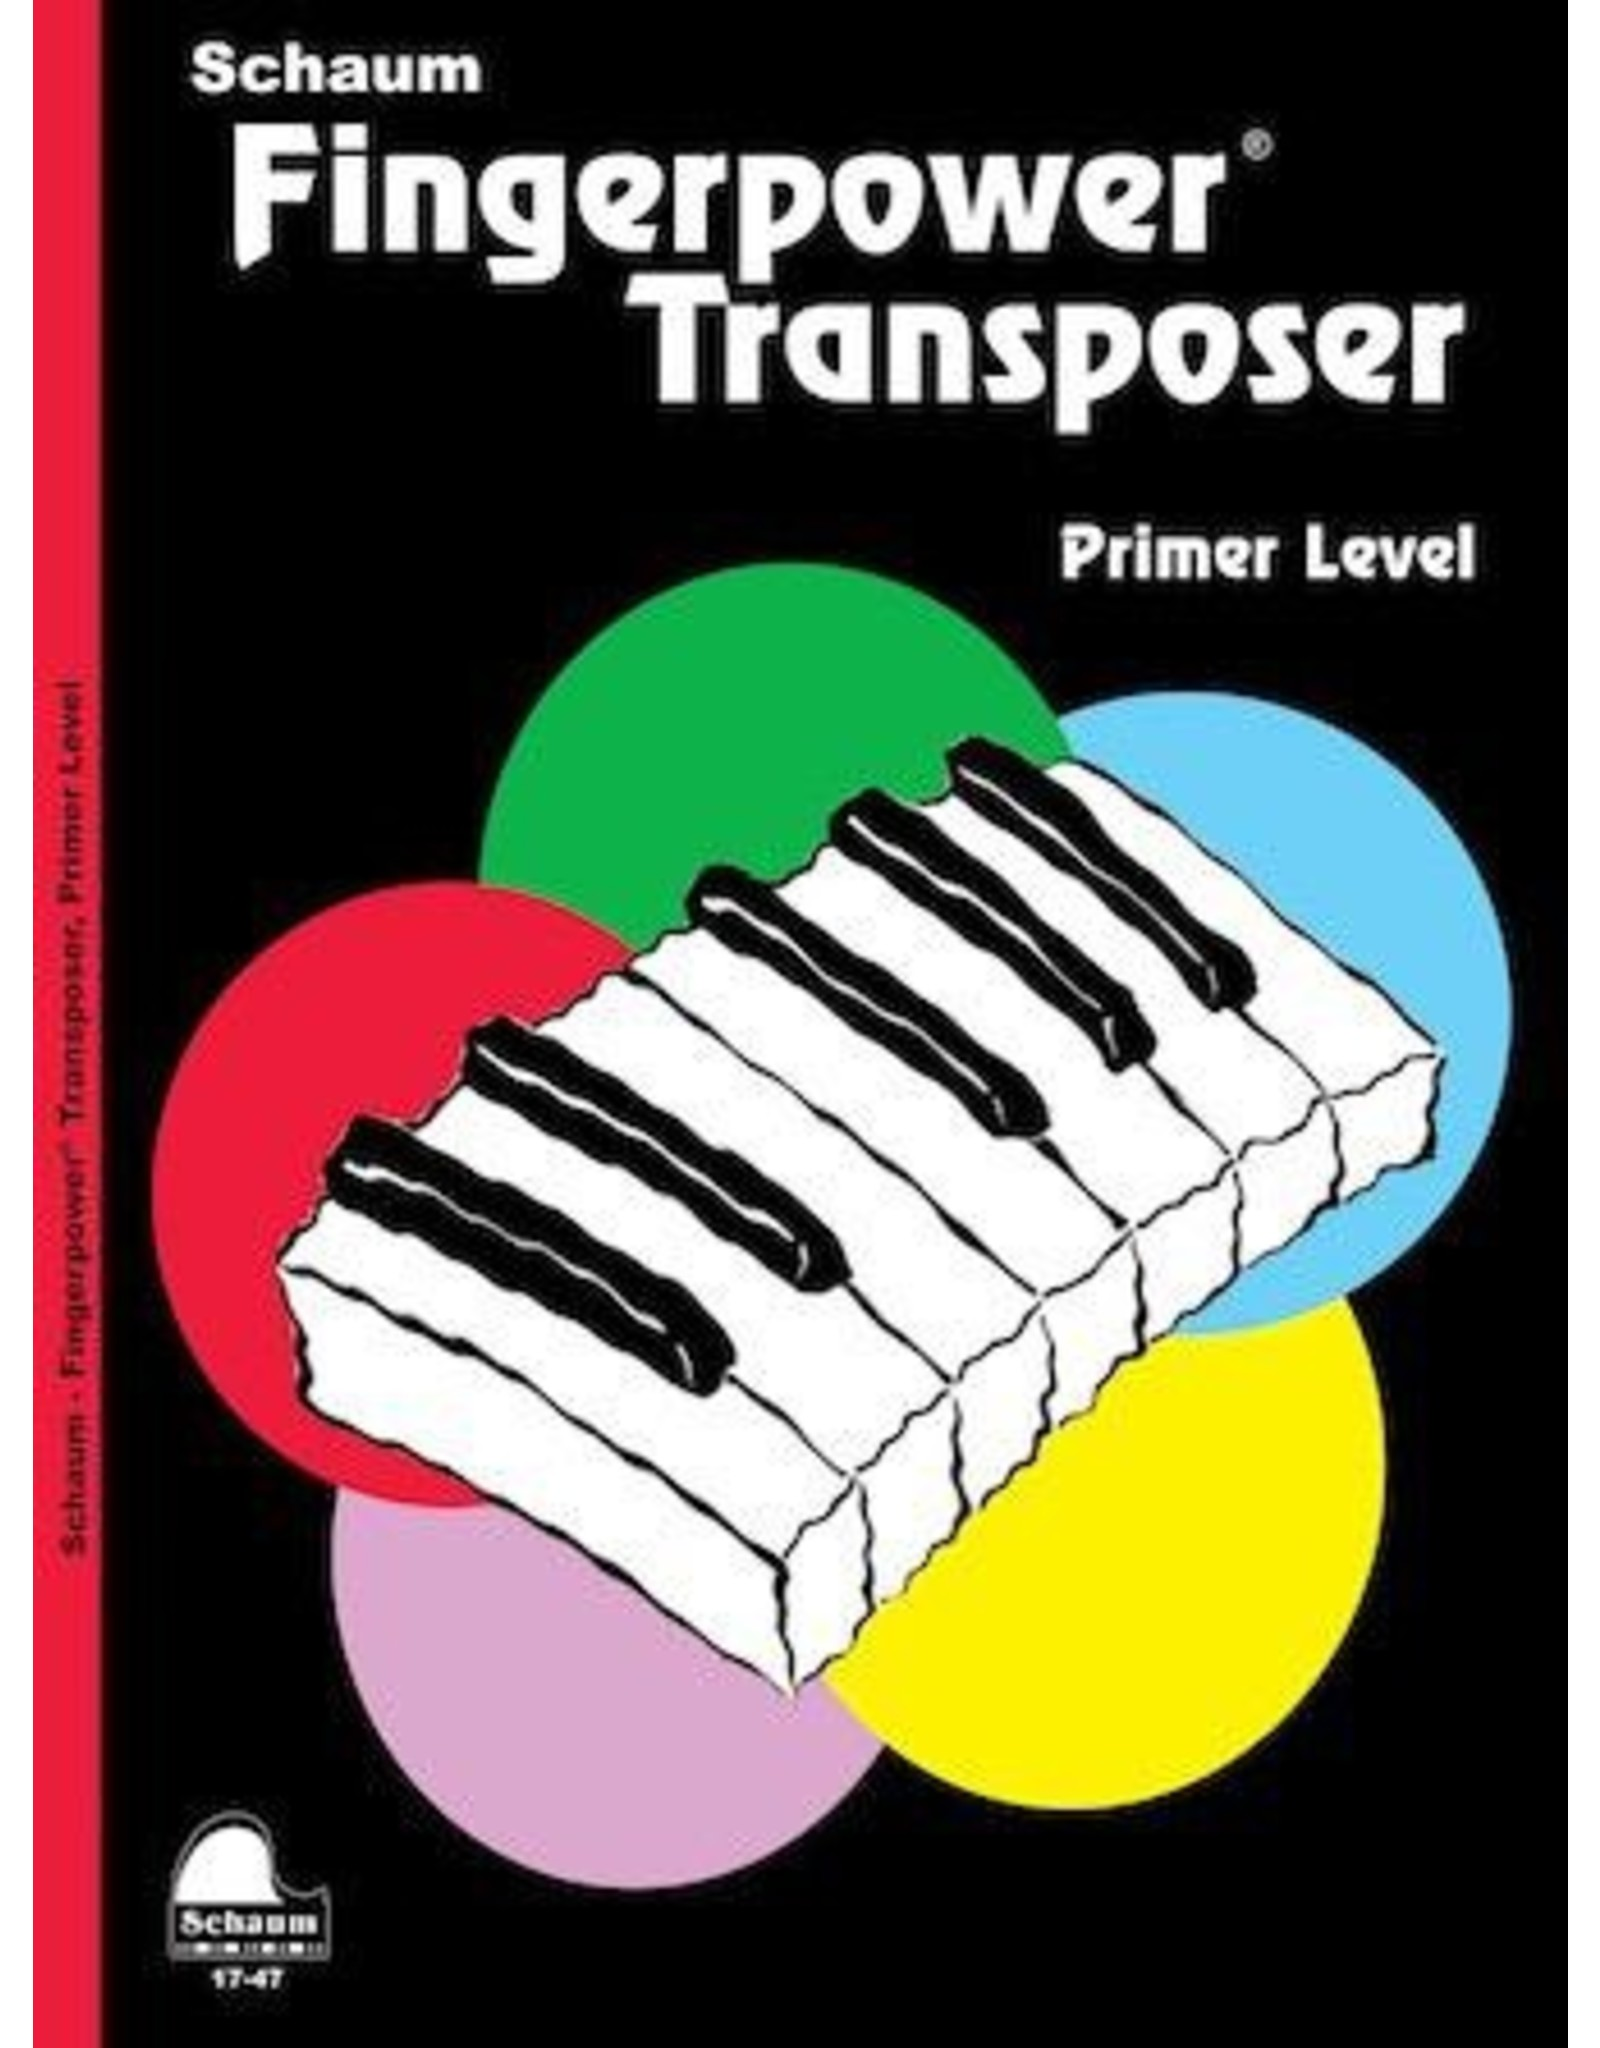 Hal Leonard Schaum Fingerpower Transposers Primer Level